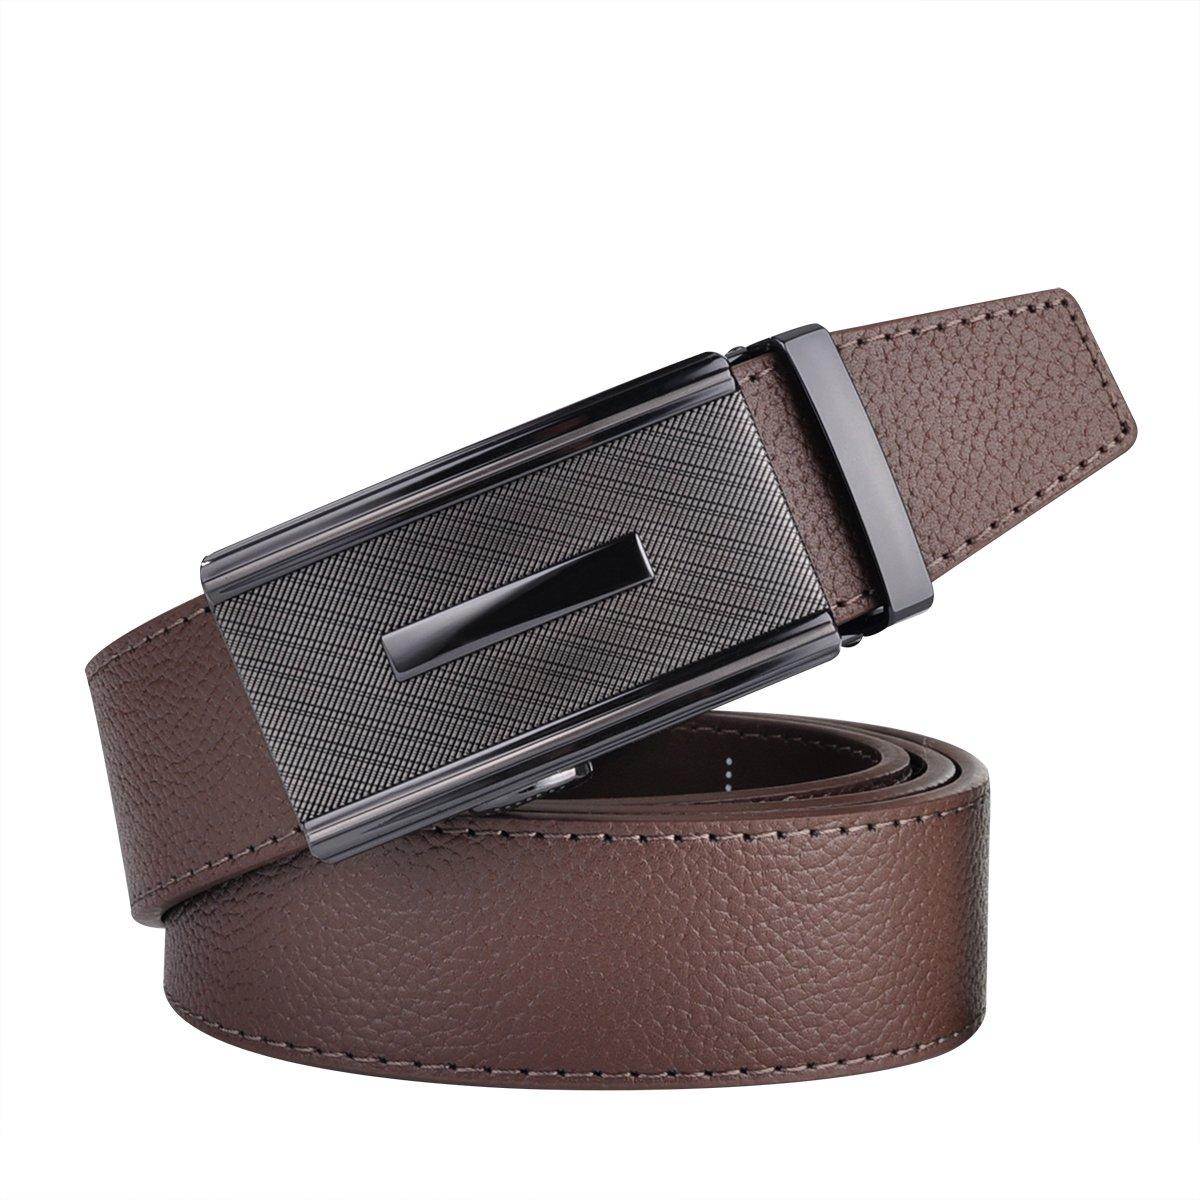 Men Designer Belt Sliding Buckle Ratchet Belt 35mm Wide 1 3/8'' Great Gift Idea by Jun Xiang (Image #3)